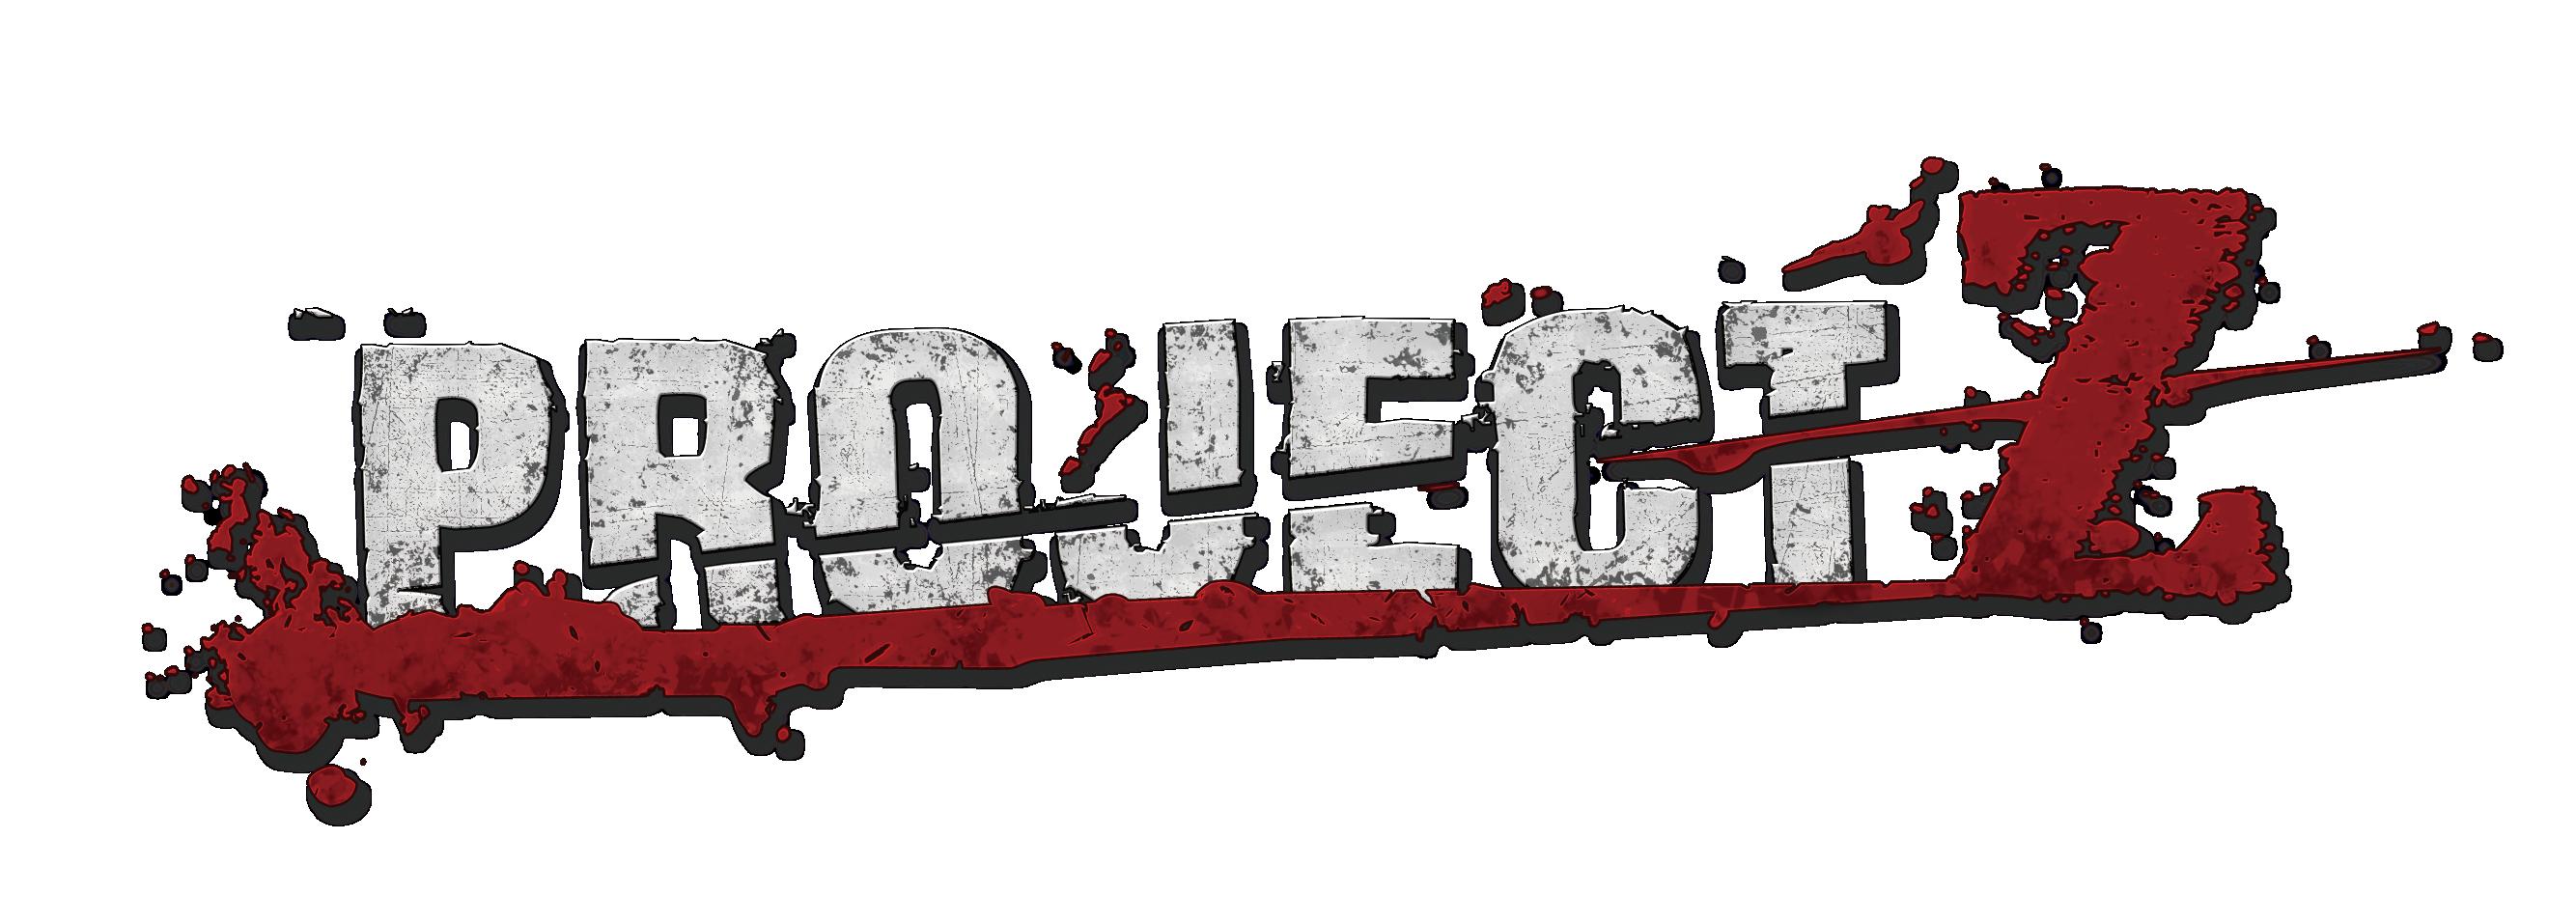 project-z-logo